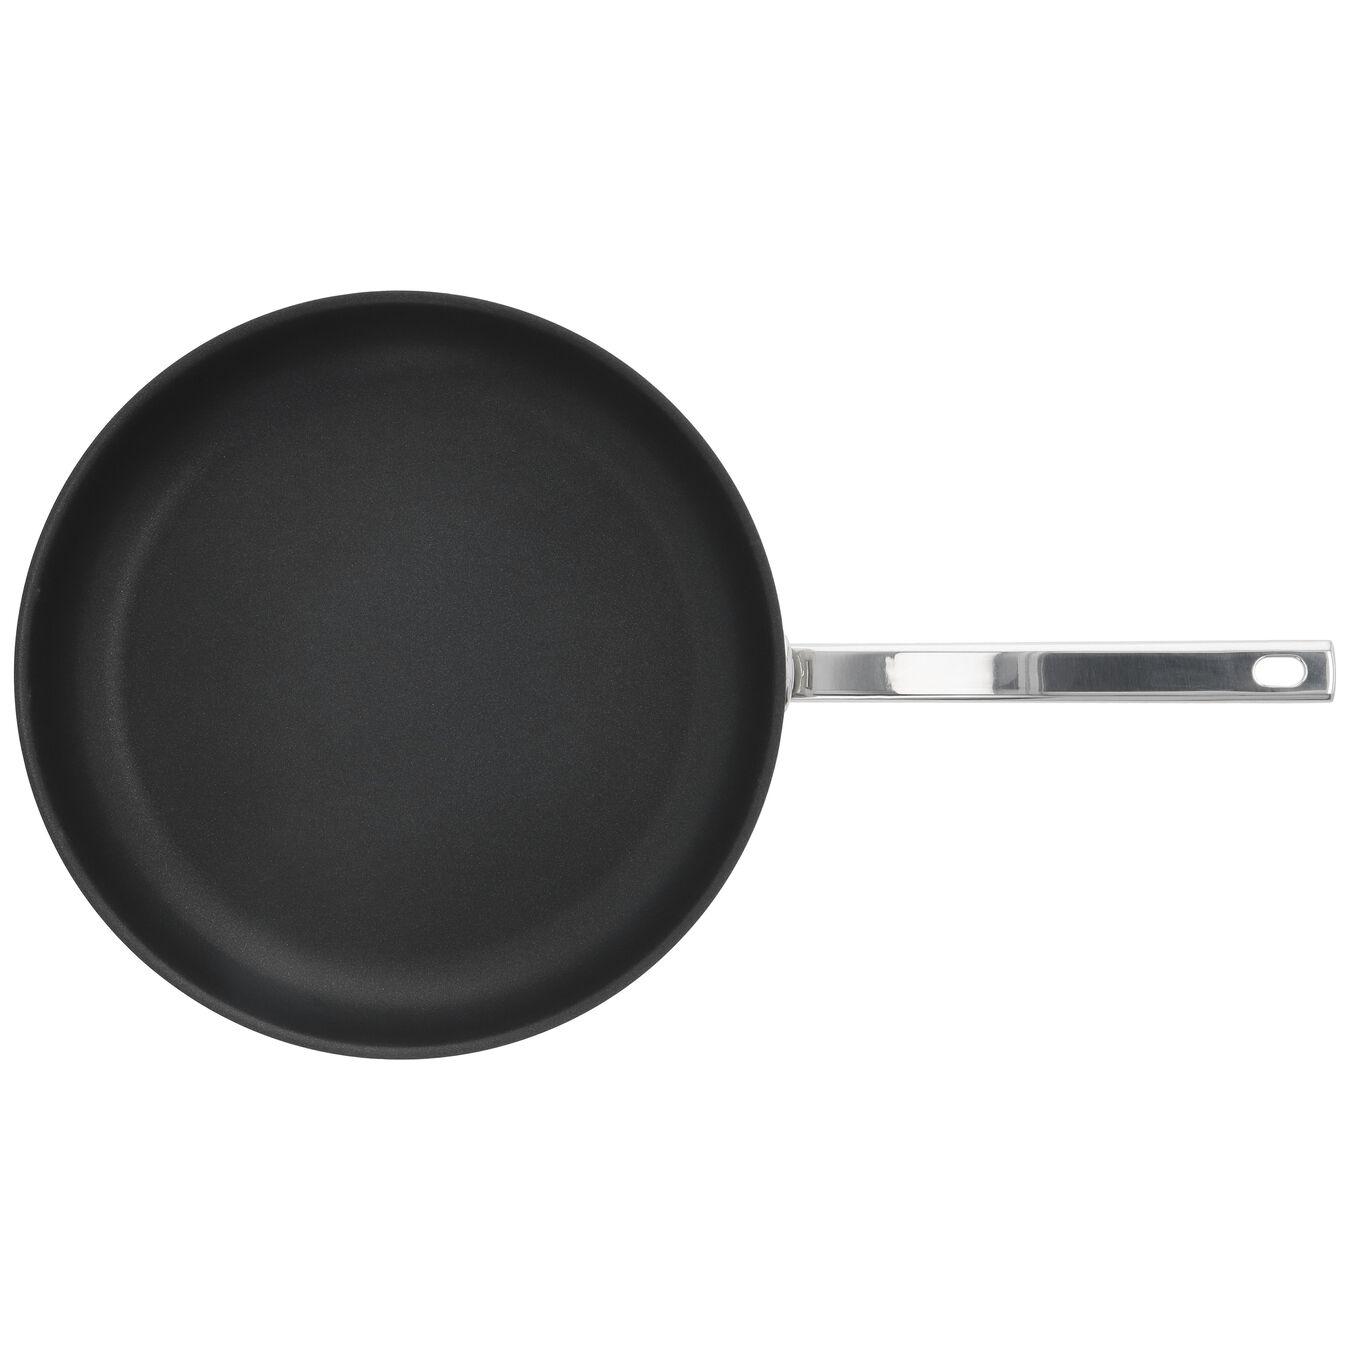 Stekpanna 32 cm, 18/10 Rostfritt stål, Silver-Svart,,large 2